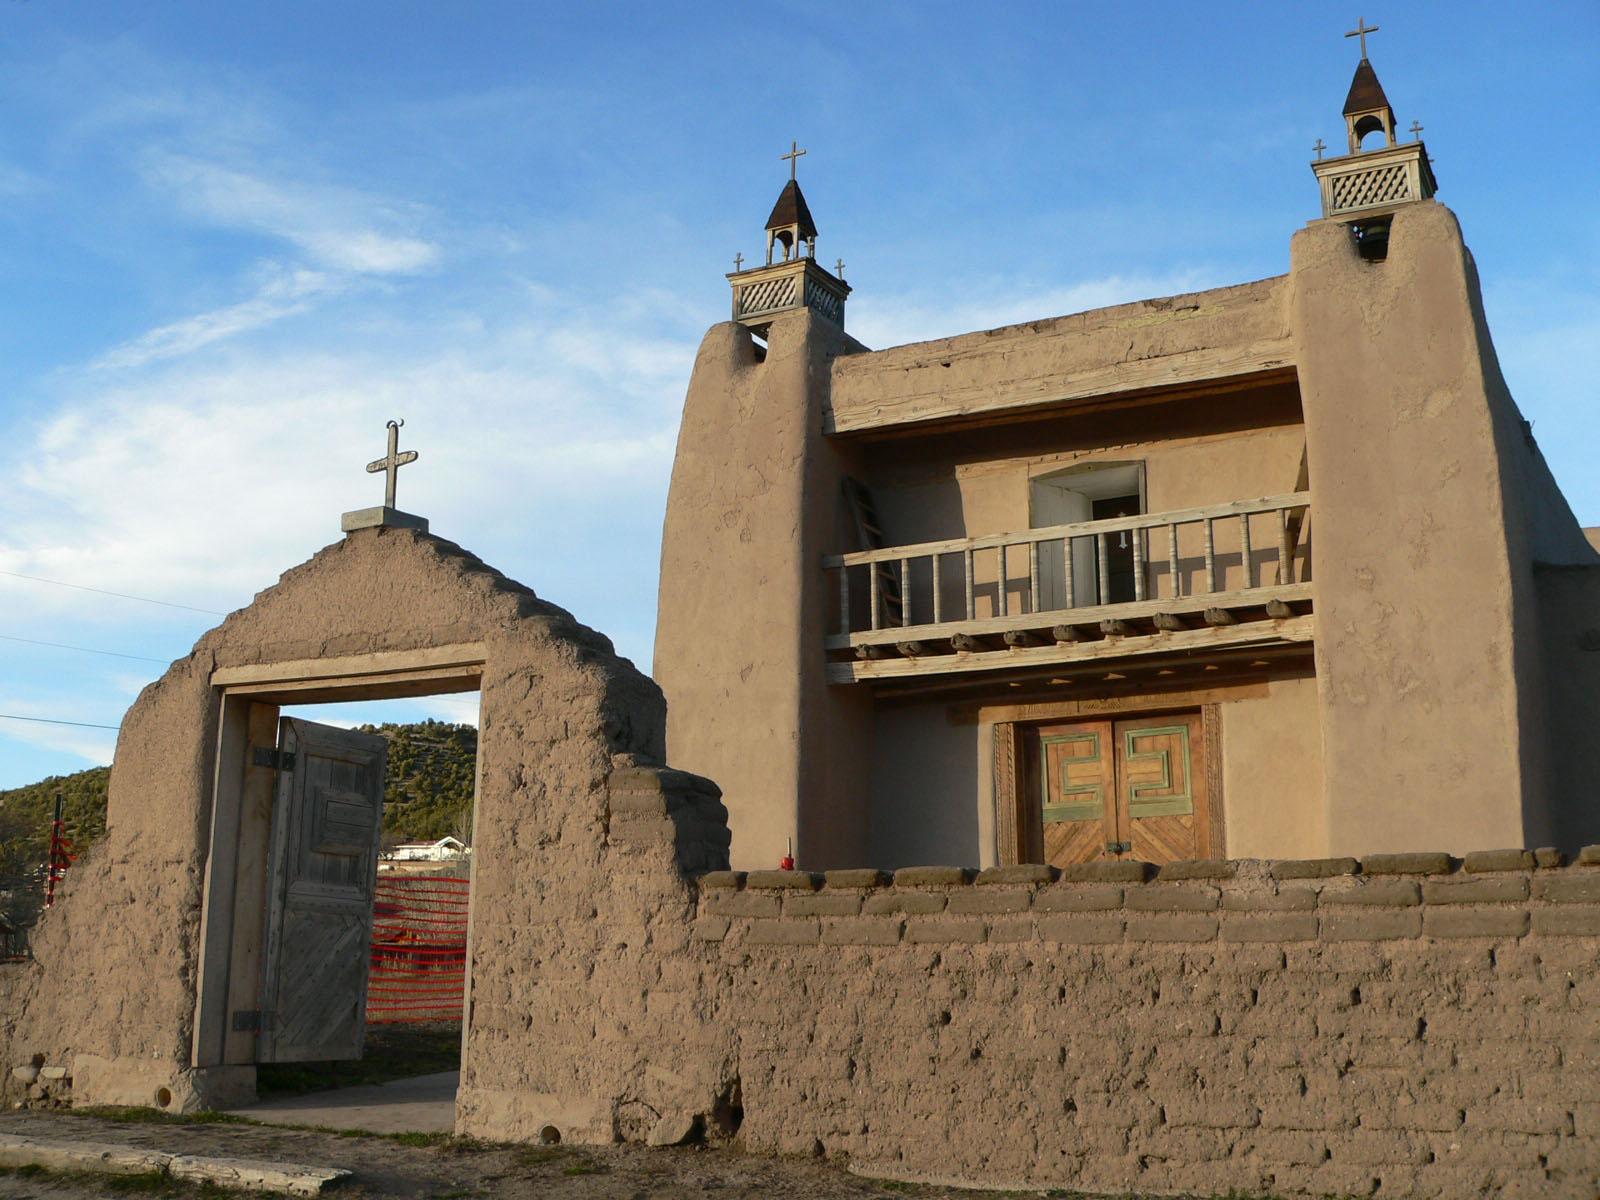 Las Truces, New Mexico